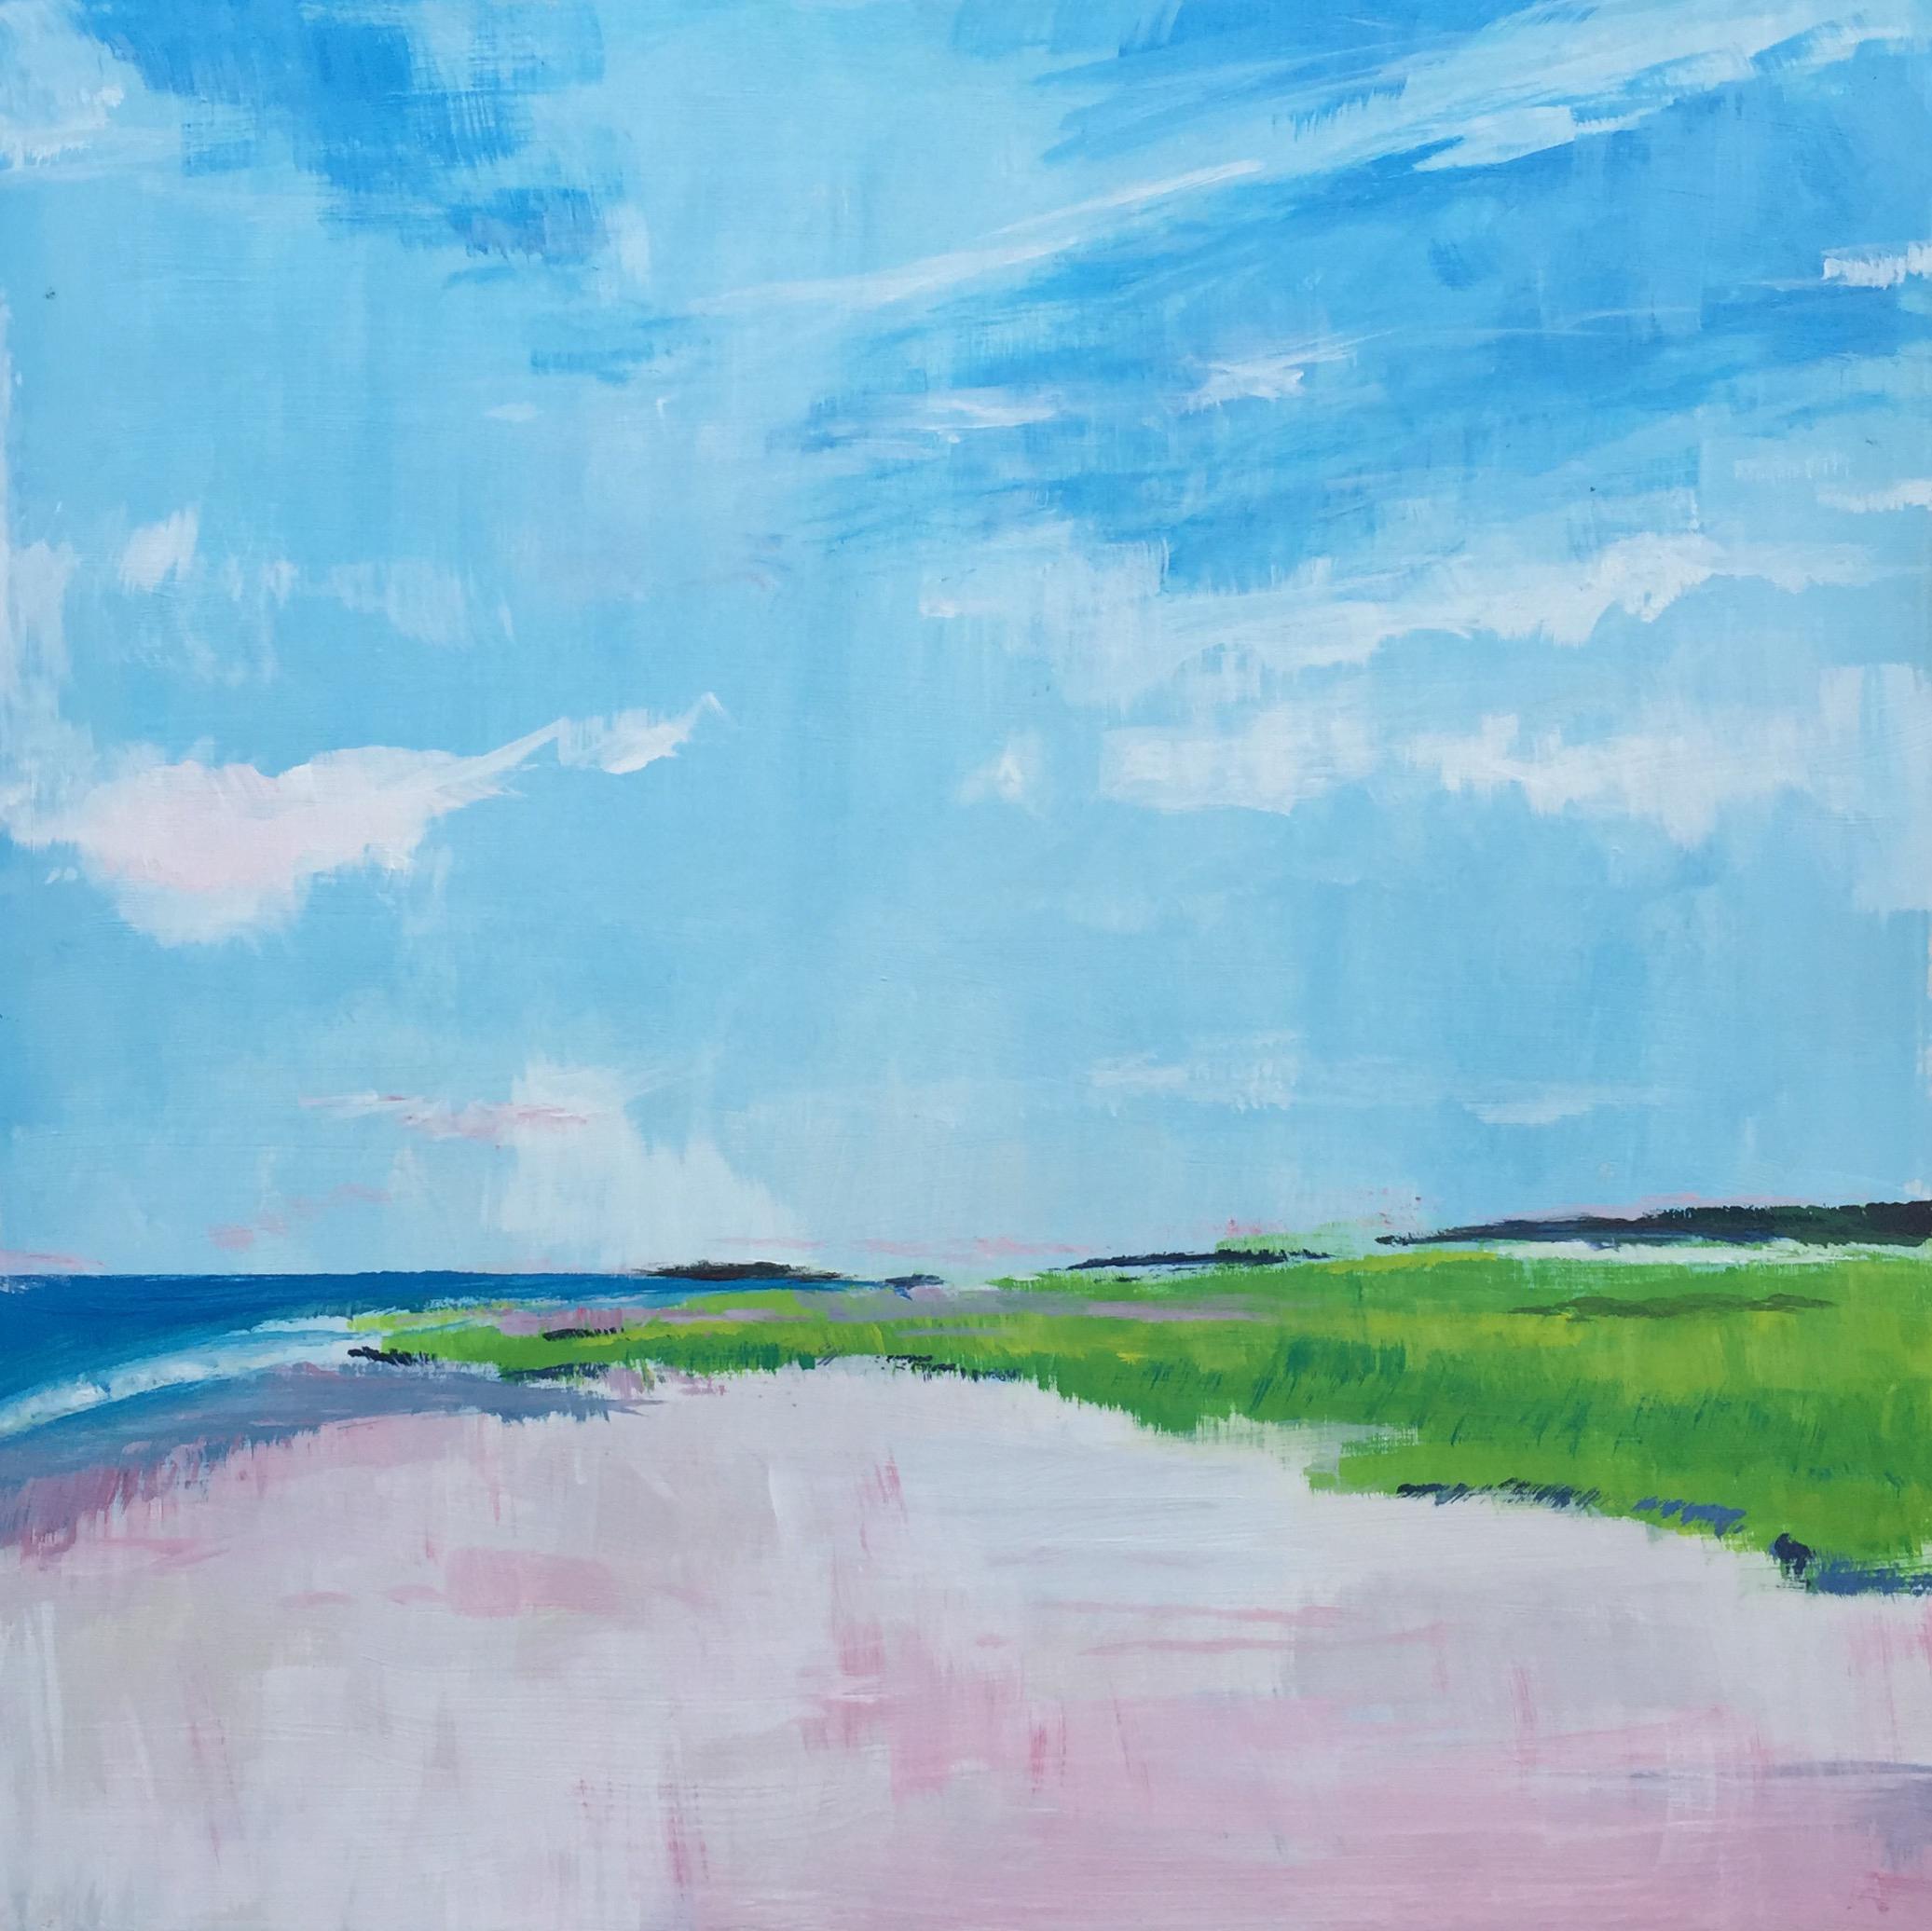 "Marco Athié ,  Skaket Beach, Cape Cod , acrylic on panel, 12"" x 12"", $450"